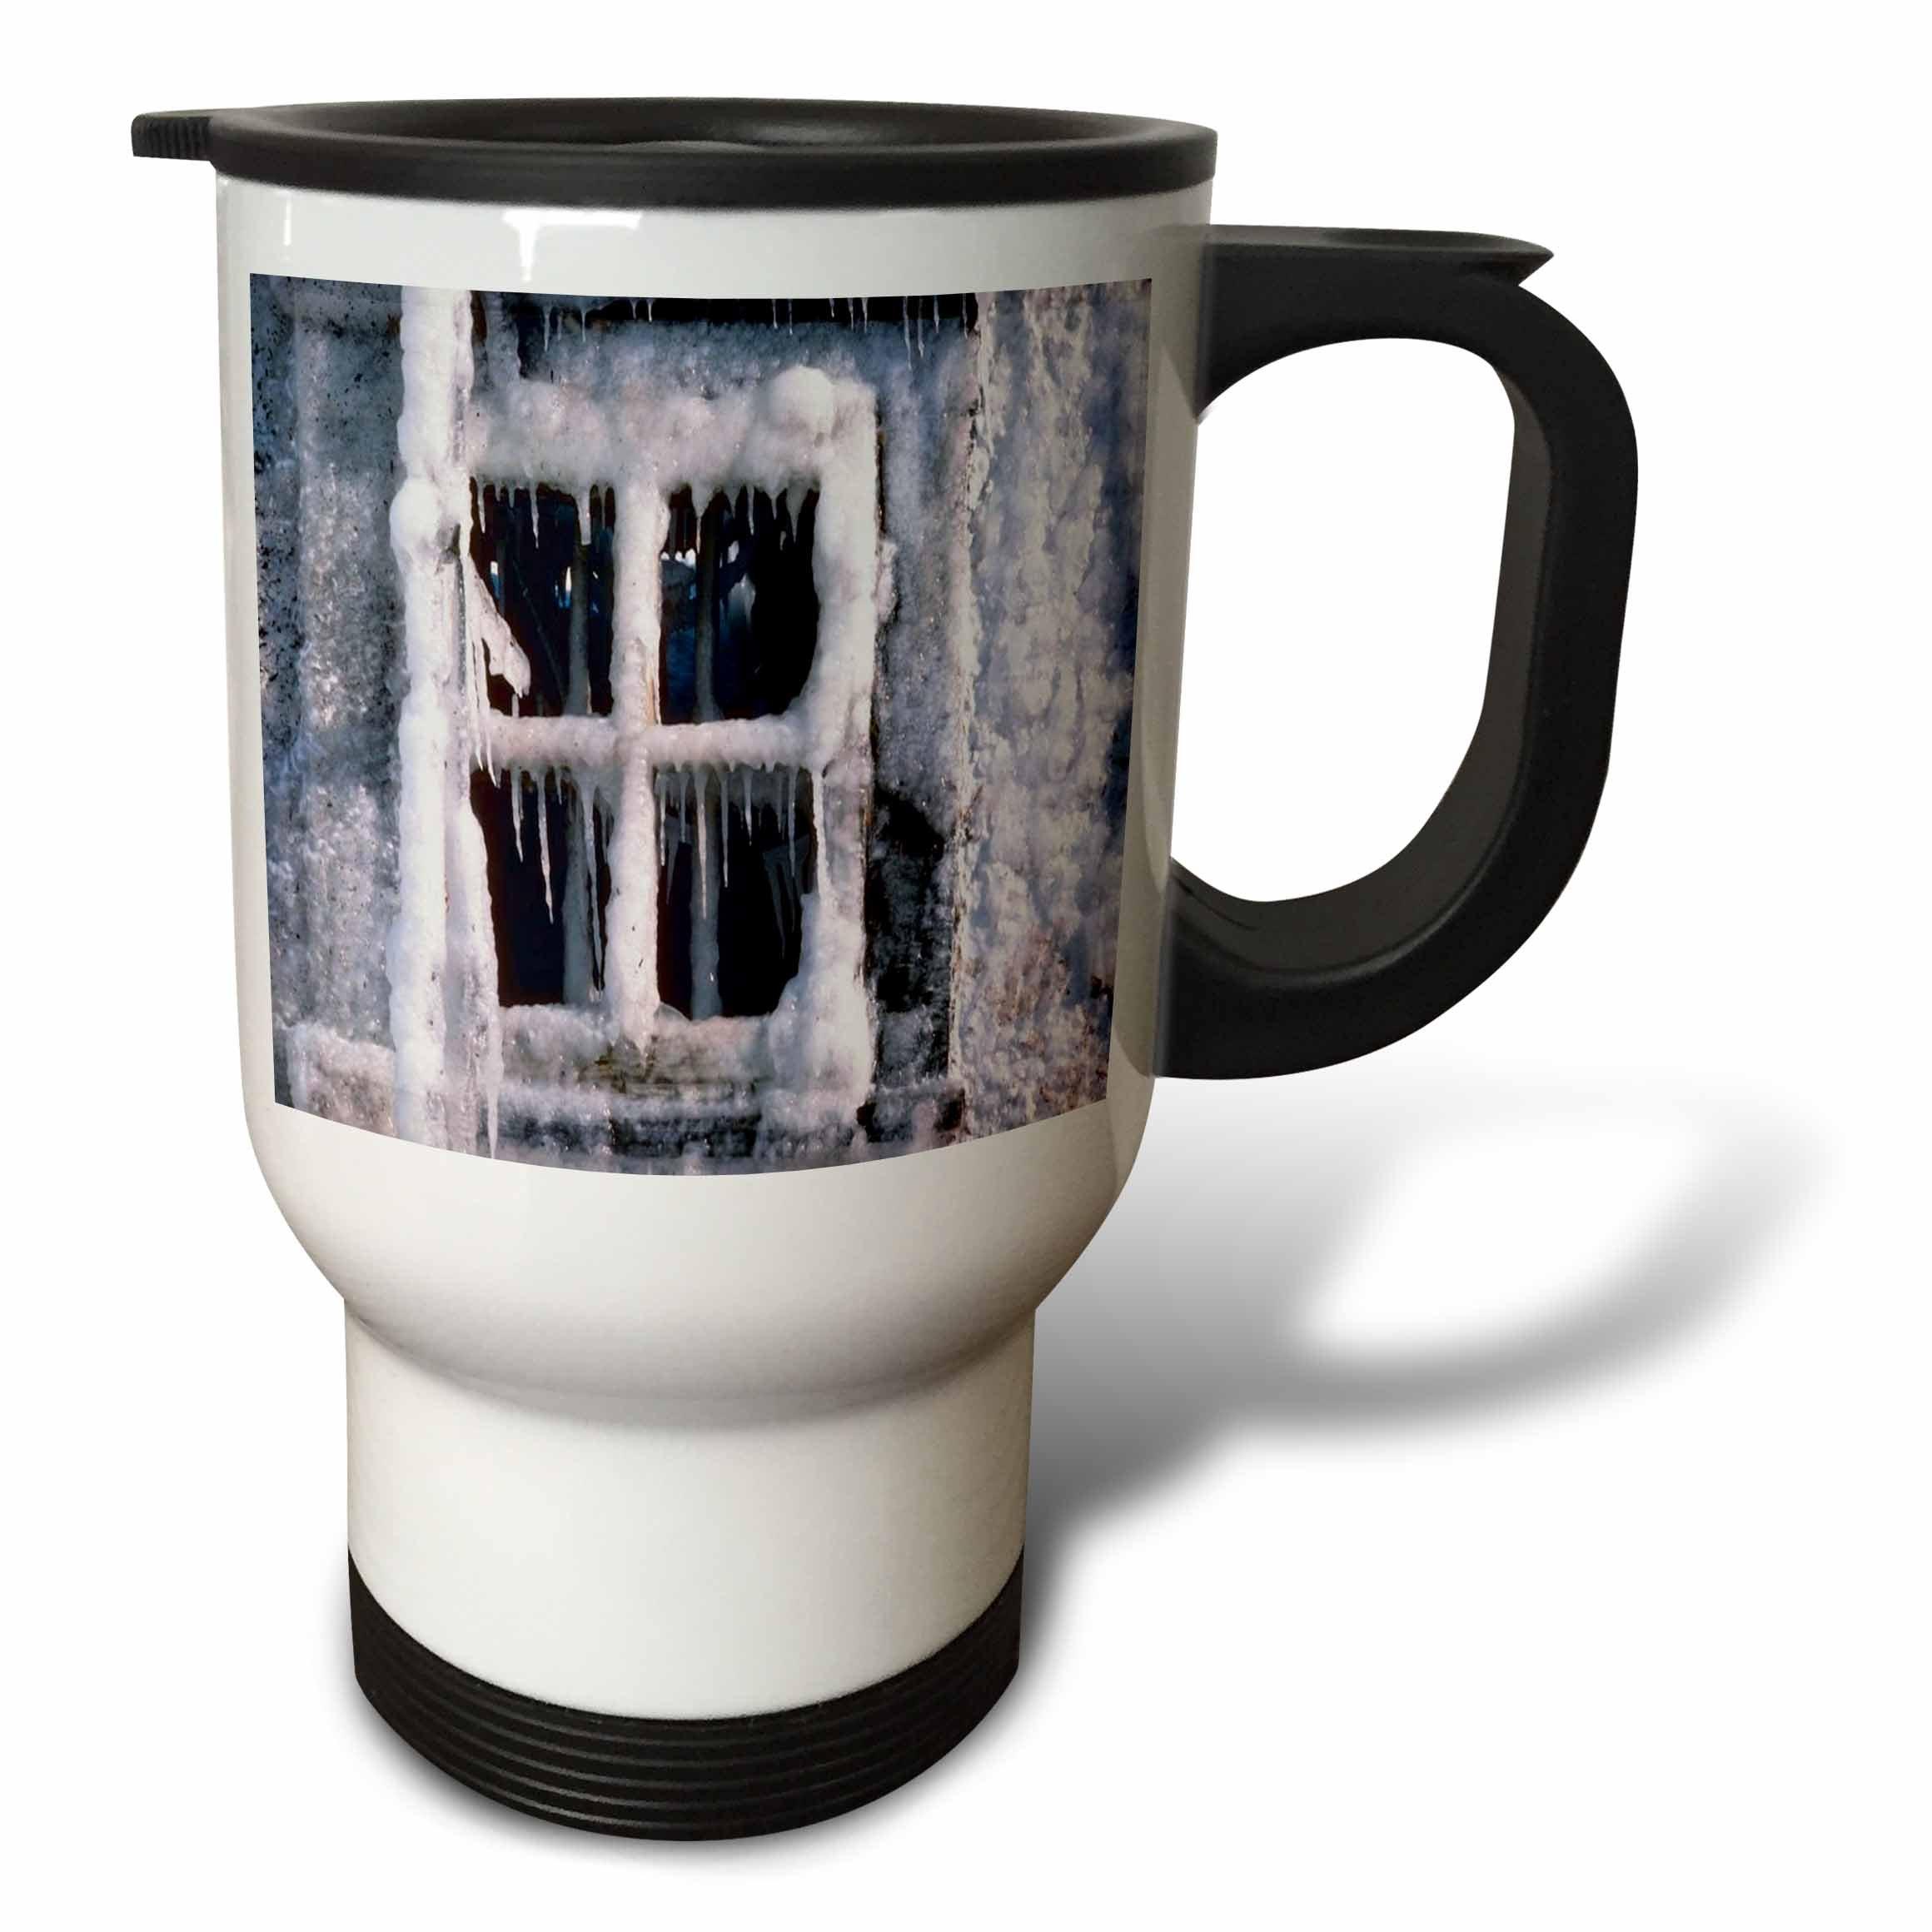 3dRose TDSwhite – Winter Seasonal Nature Photos - Snowed In Window - 14oz Stainless Steel Travel Mug (tm_284914_1)